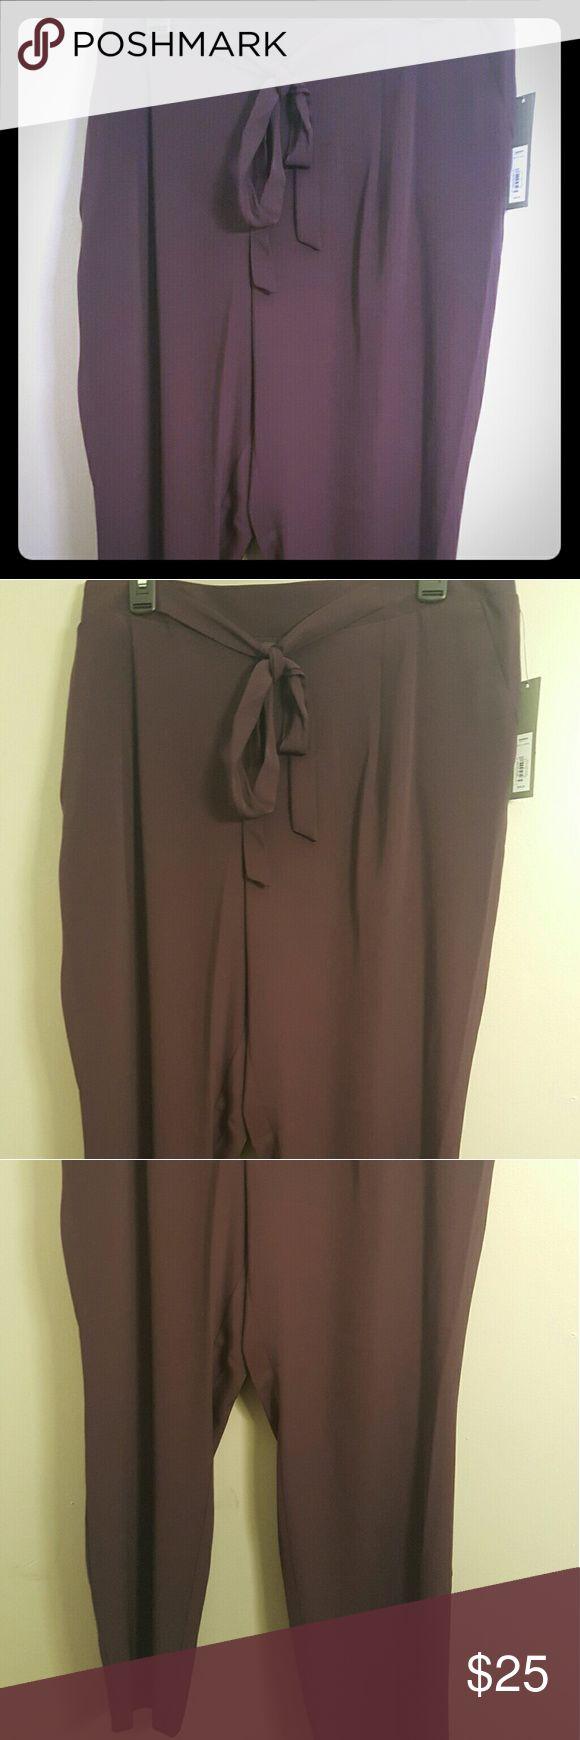 Plum pants with bow design Women's XL Apt 9 Brand New Purple Pants Apt. 9 Pants